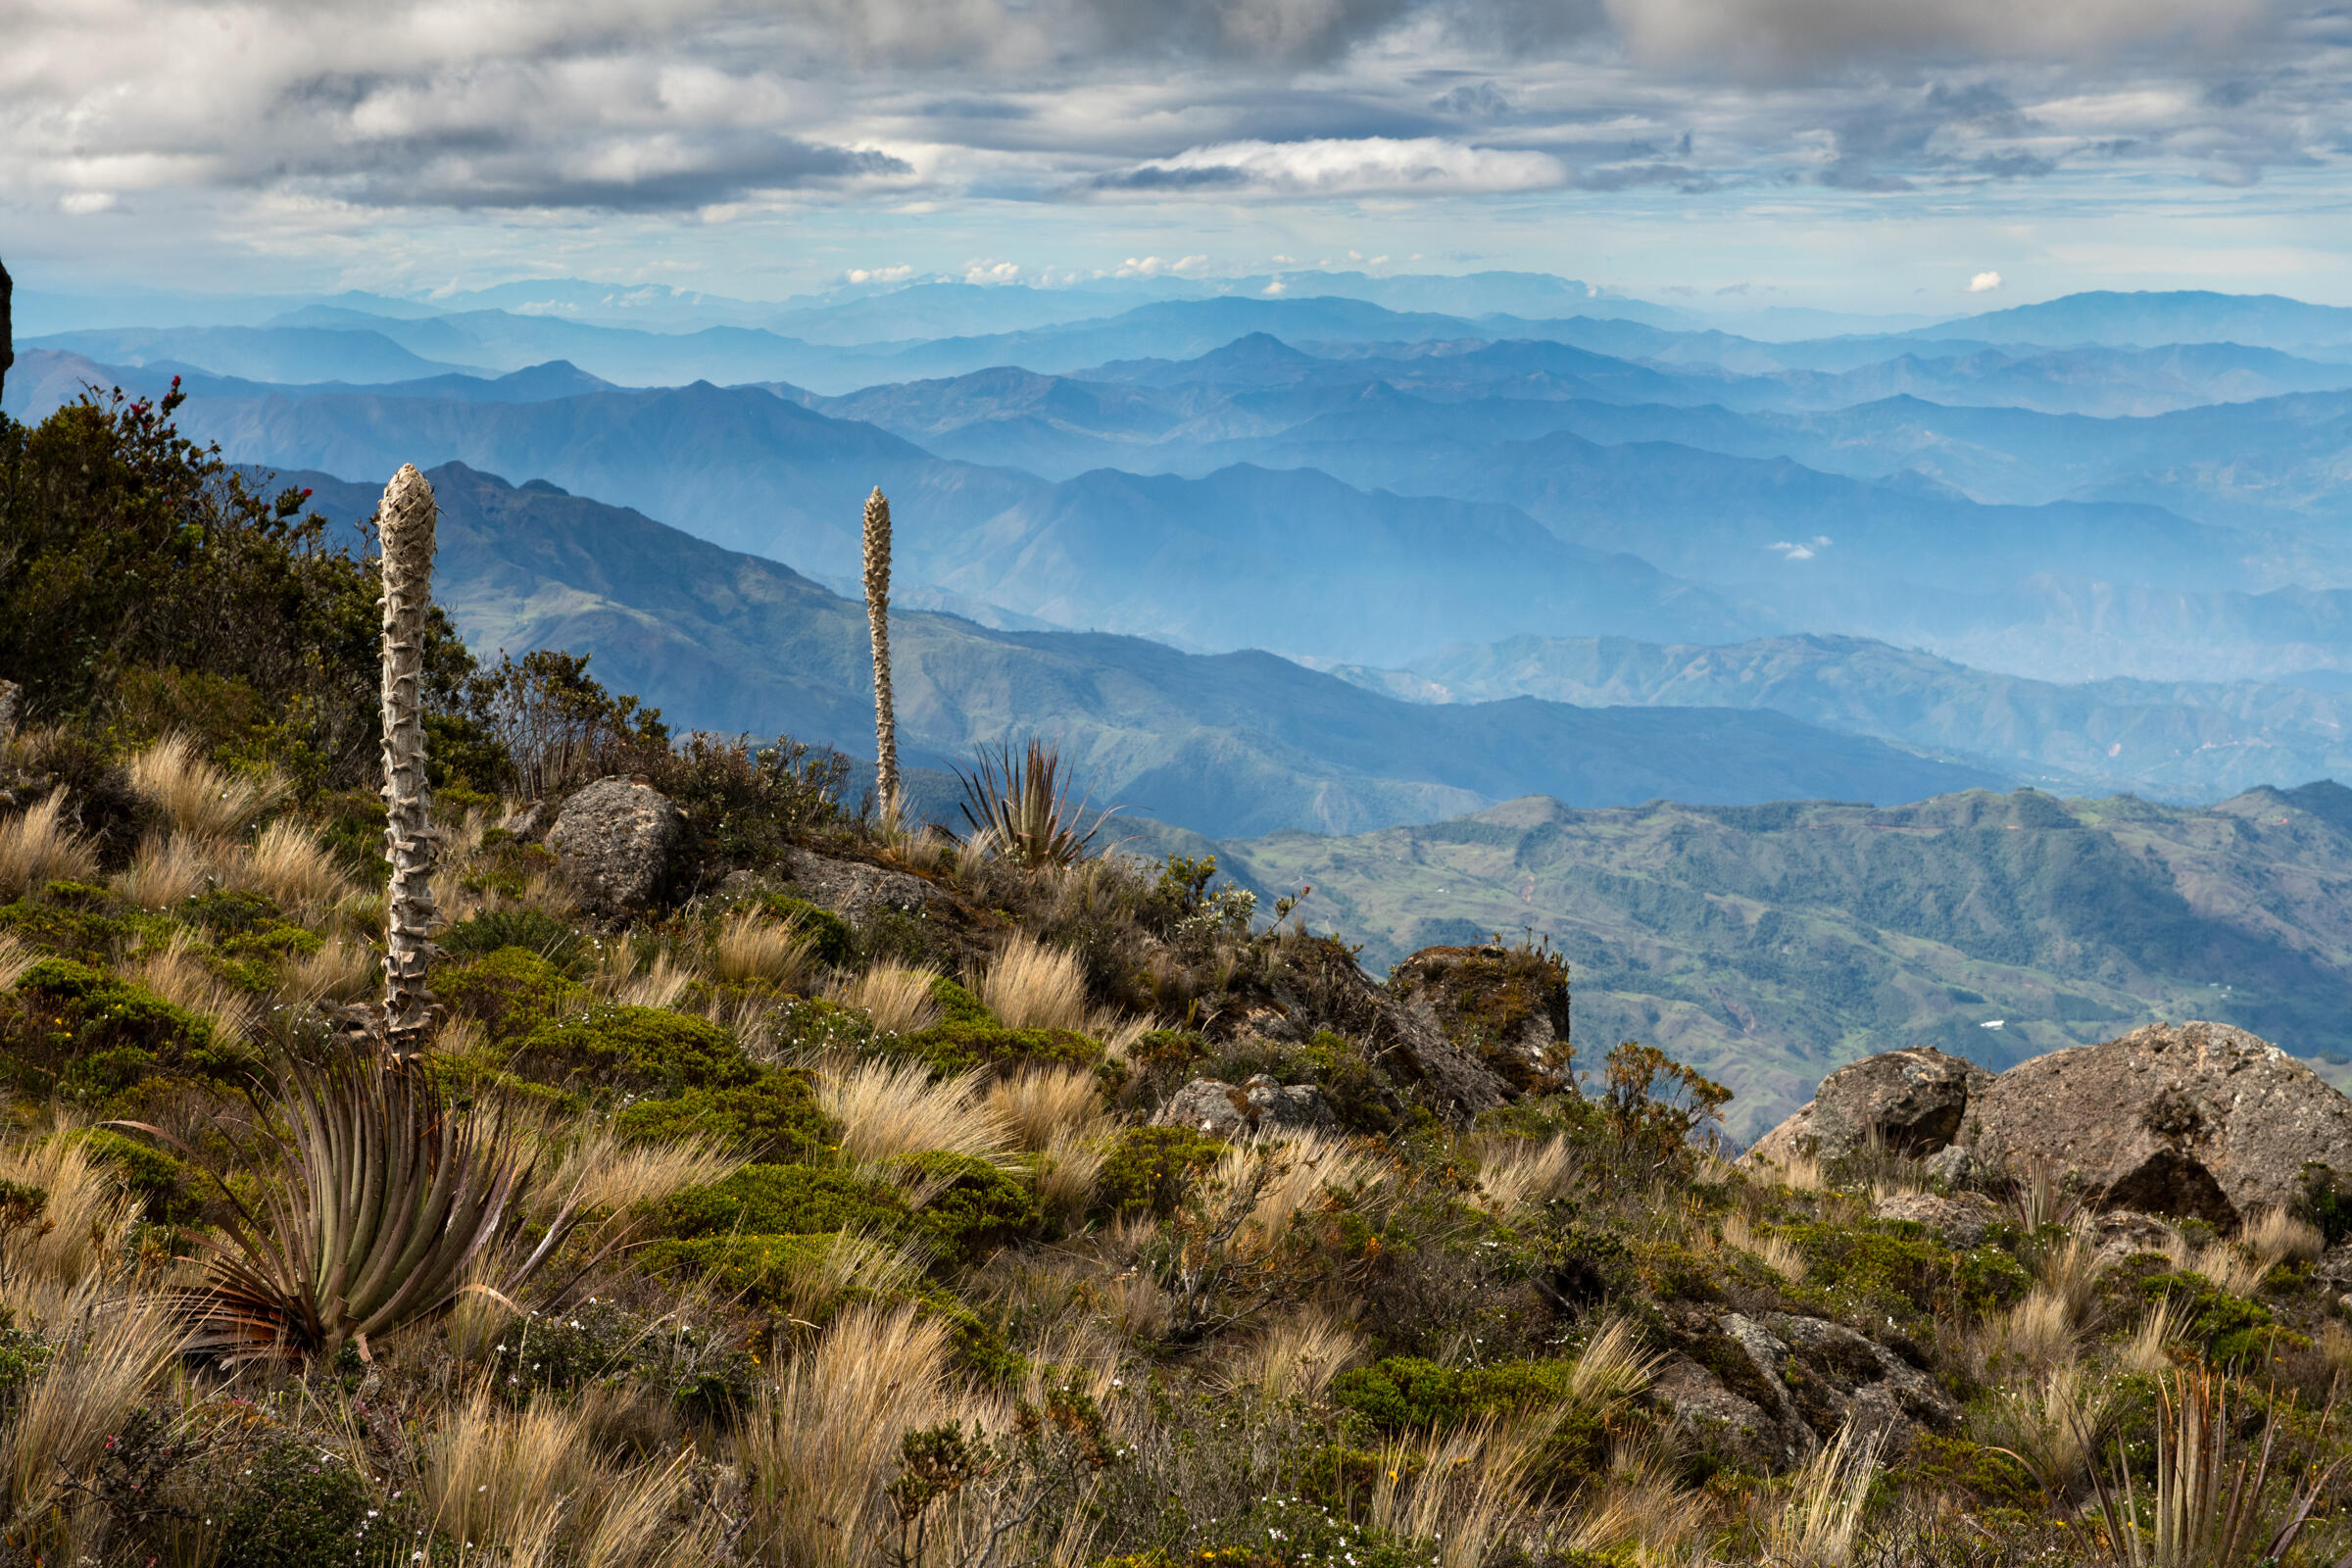 Cerro de Arcos habitat is under threat from land clearing. Murray Cooper